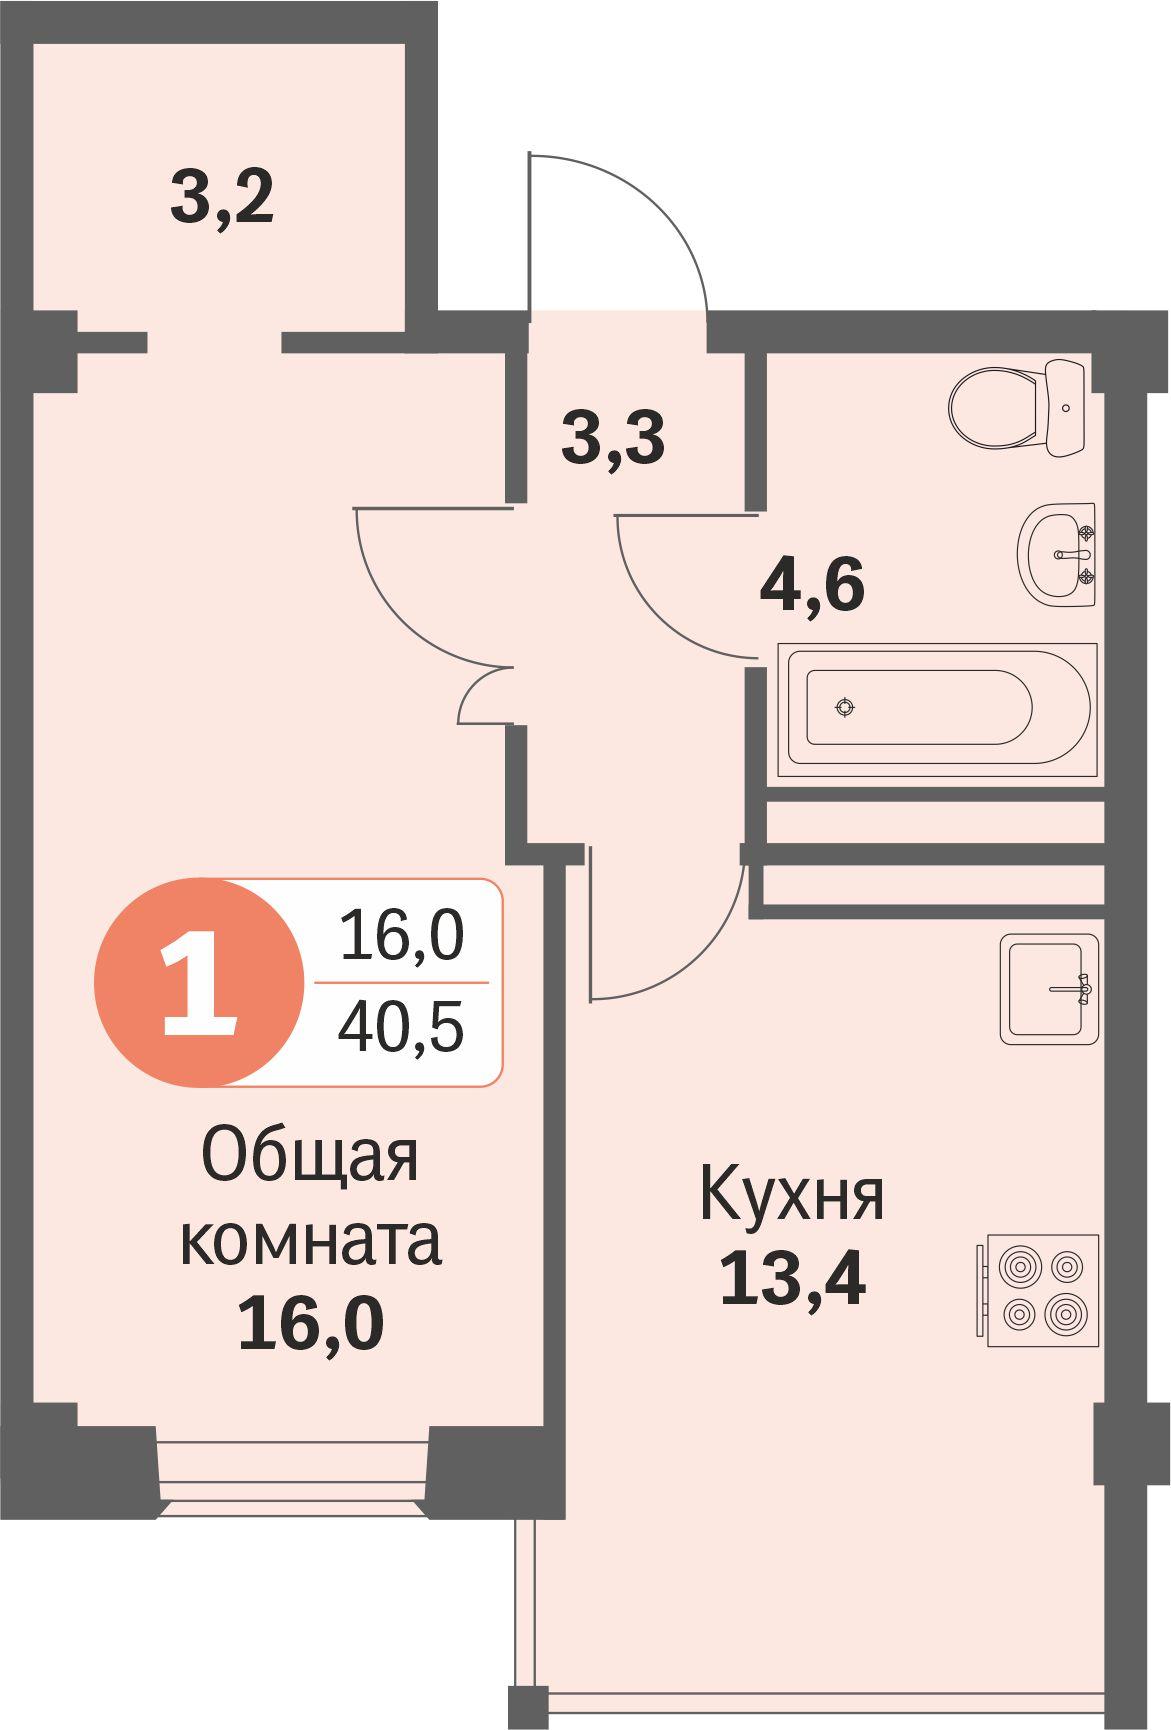 ул. Стаханова, 58, квартира 422 - Однокомнатная